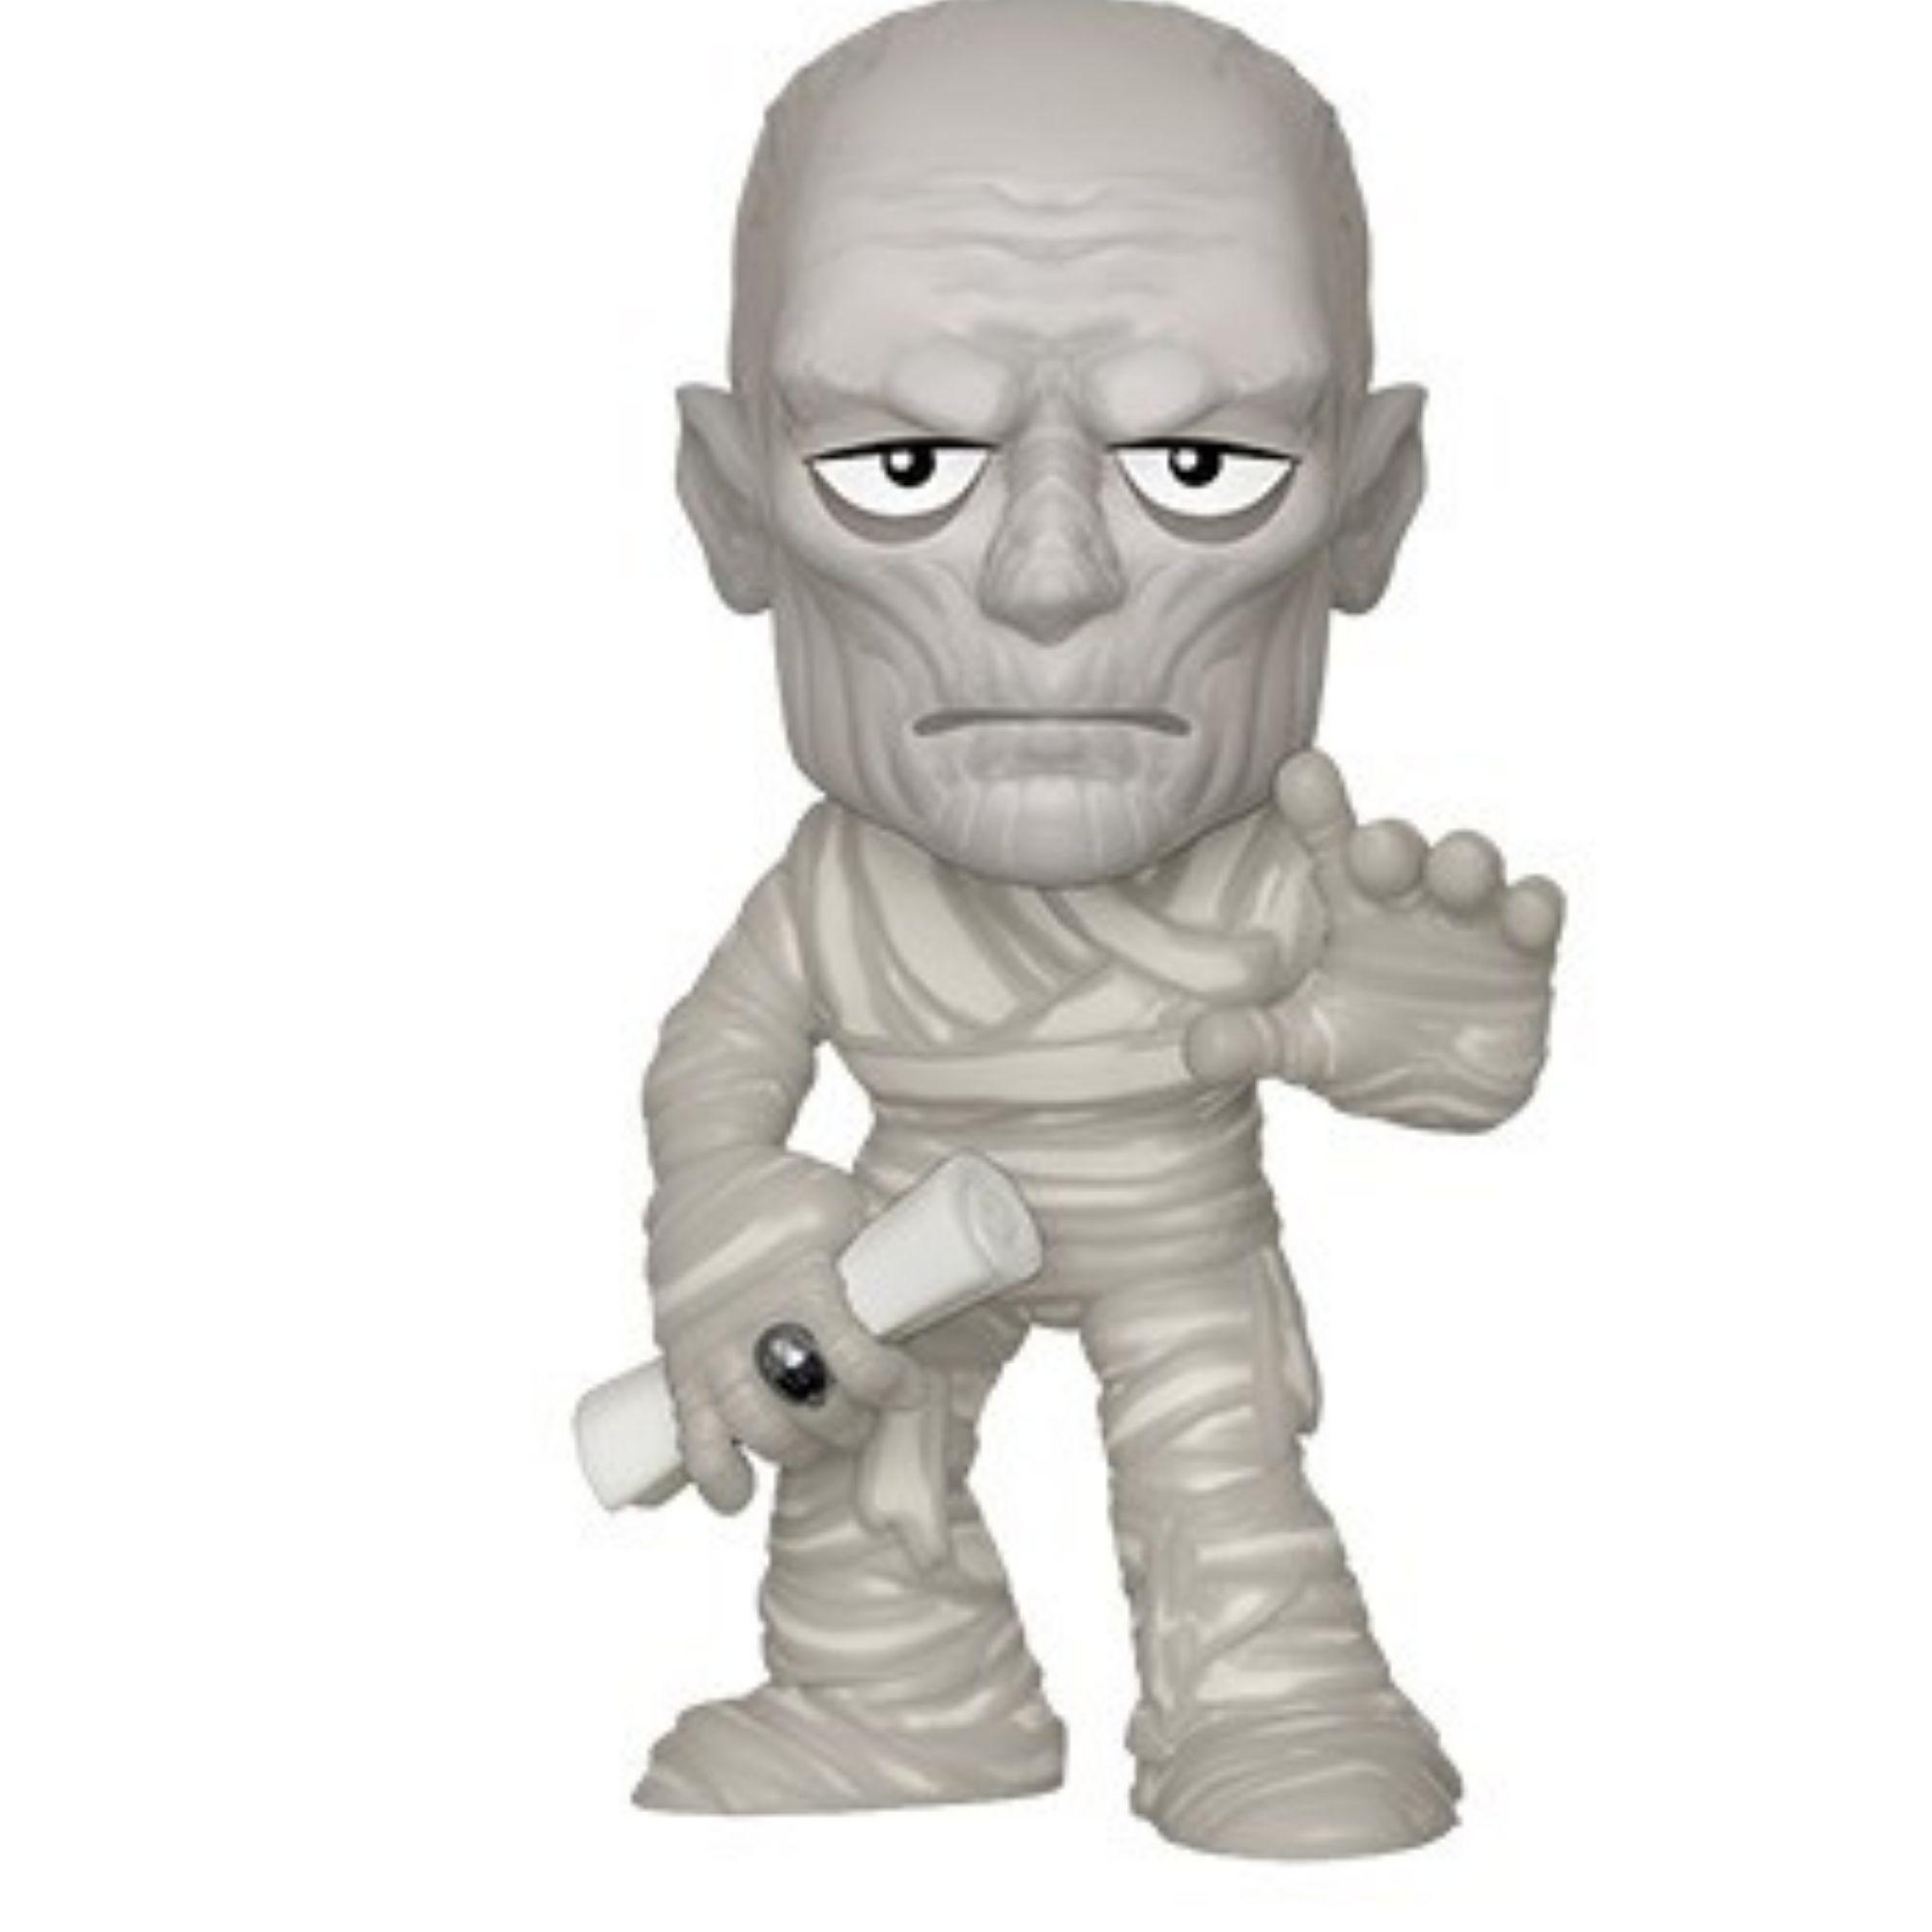 Funko Mini Mystery Universal Monsters Múmia Exclusivo Walgreens  - Game Land Brinquedos